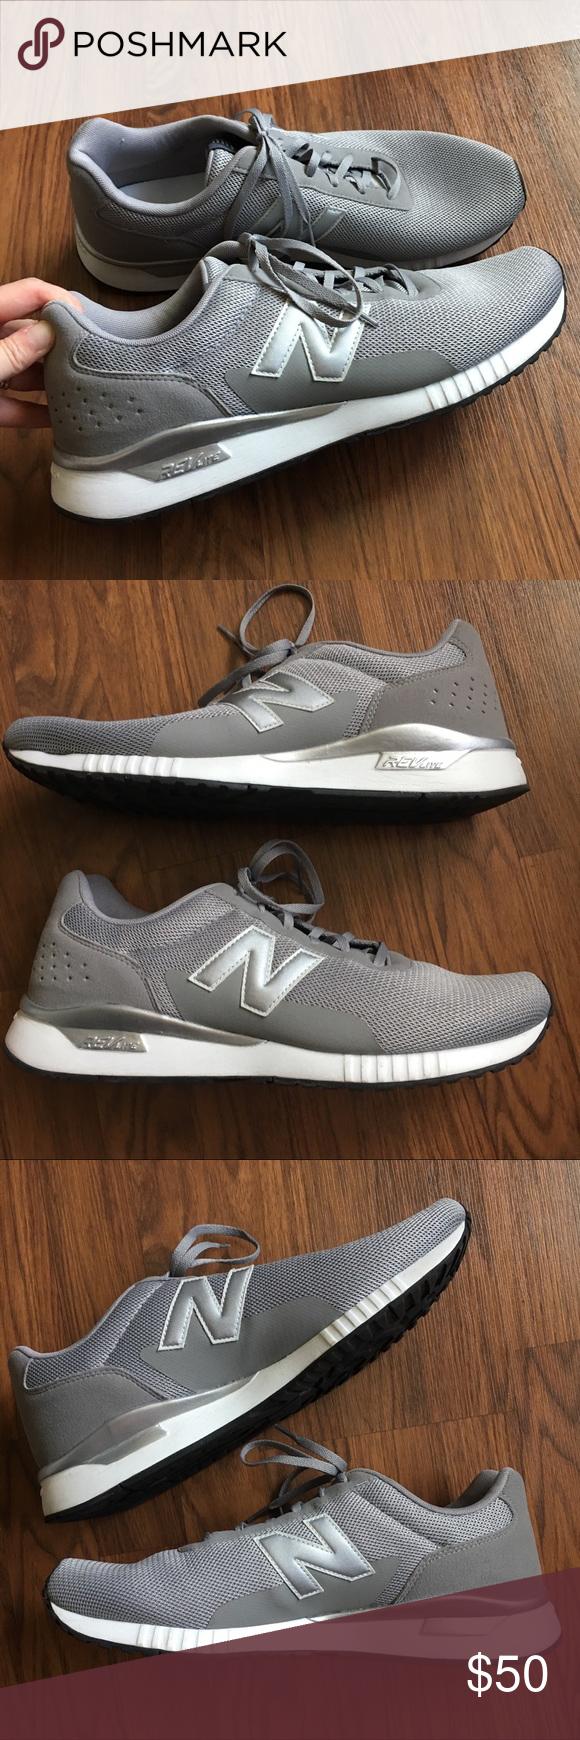 New balance shoes men